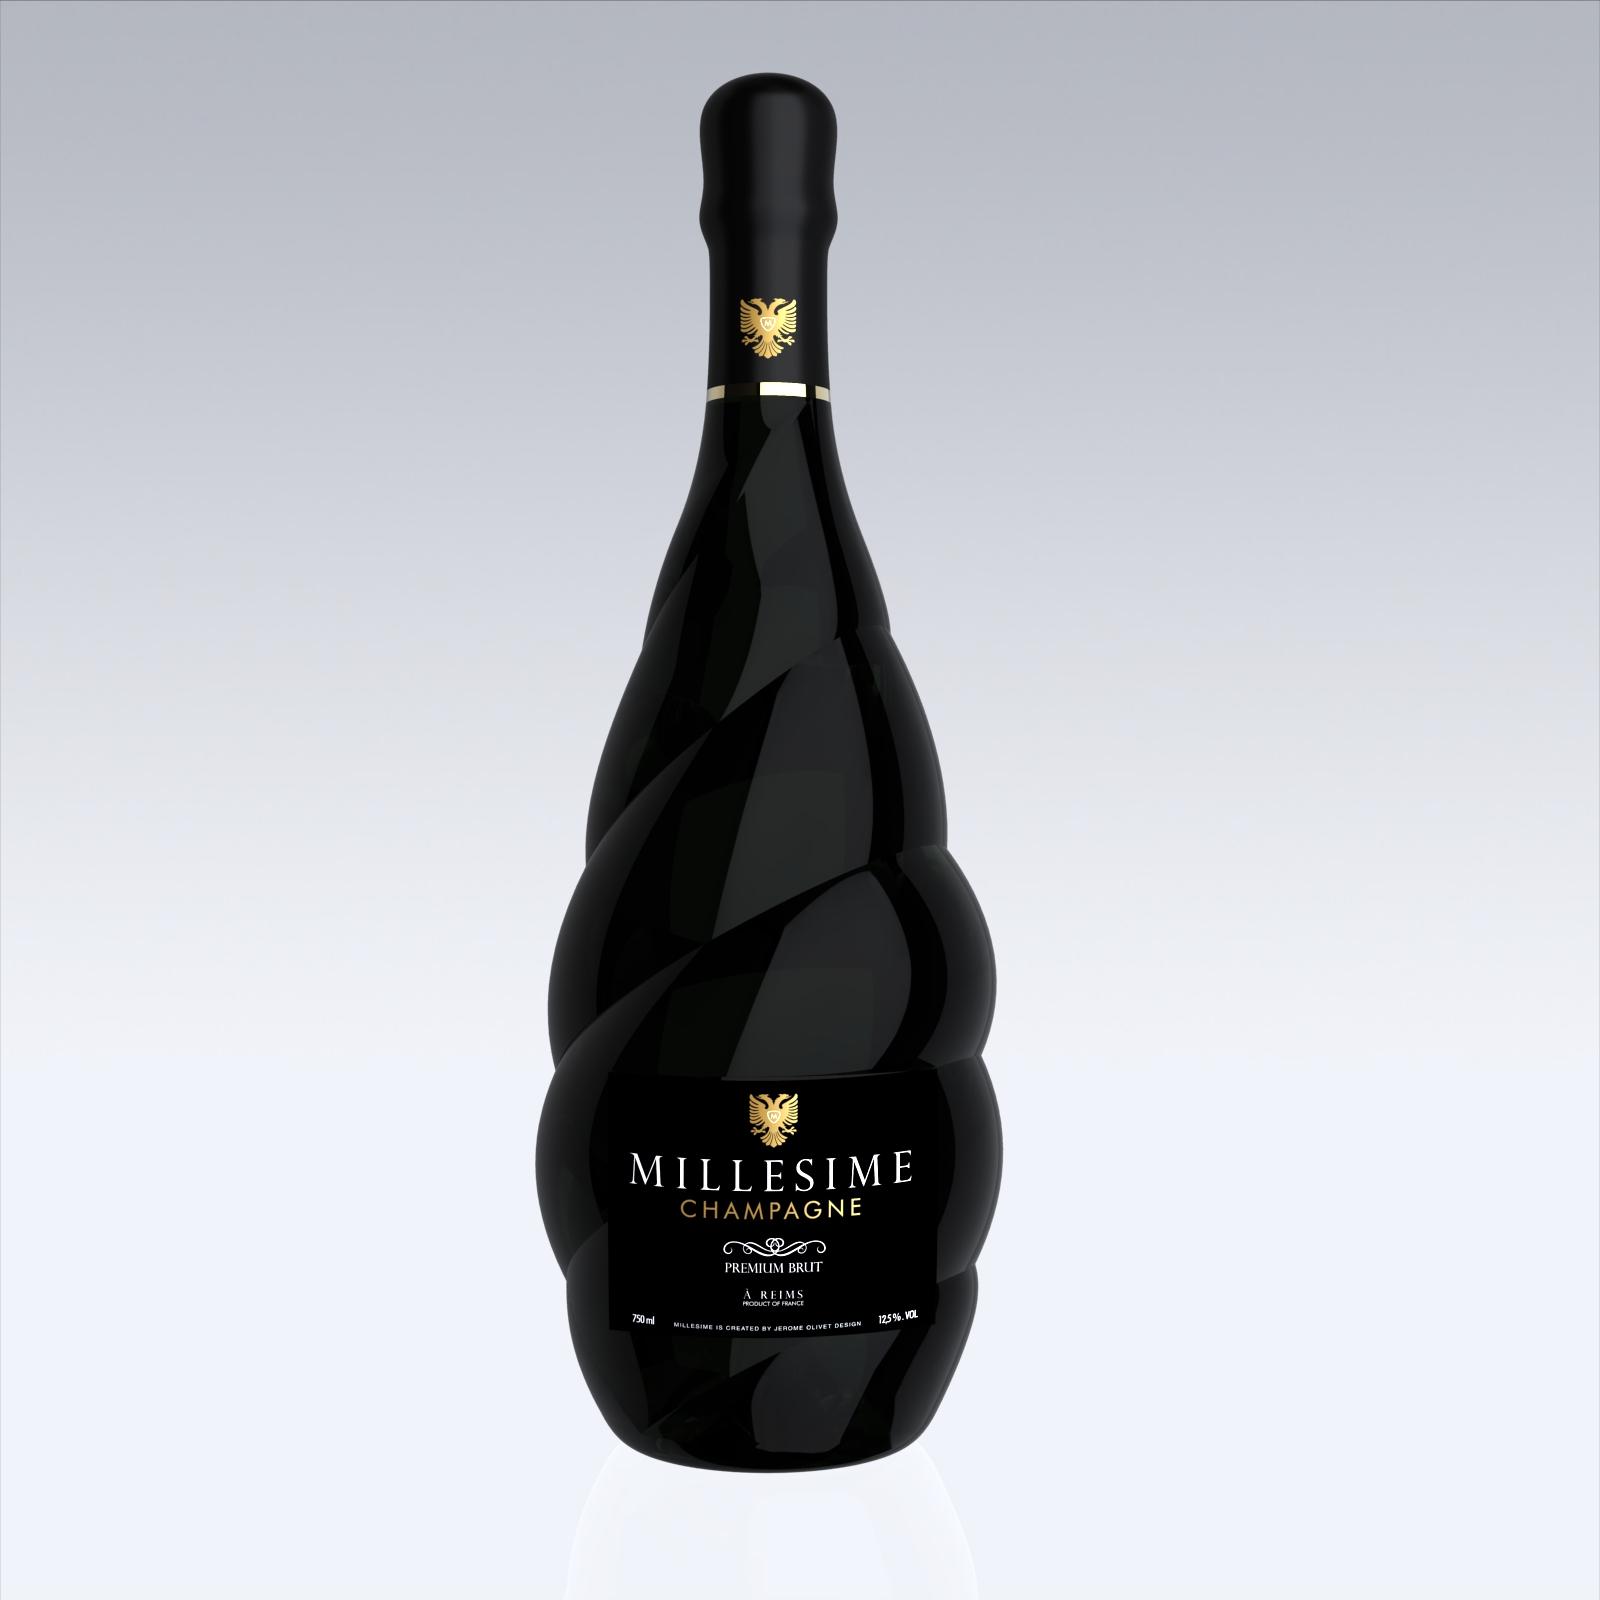 Millesime champagne jerome olivet